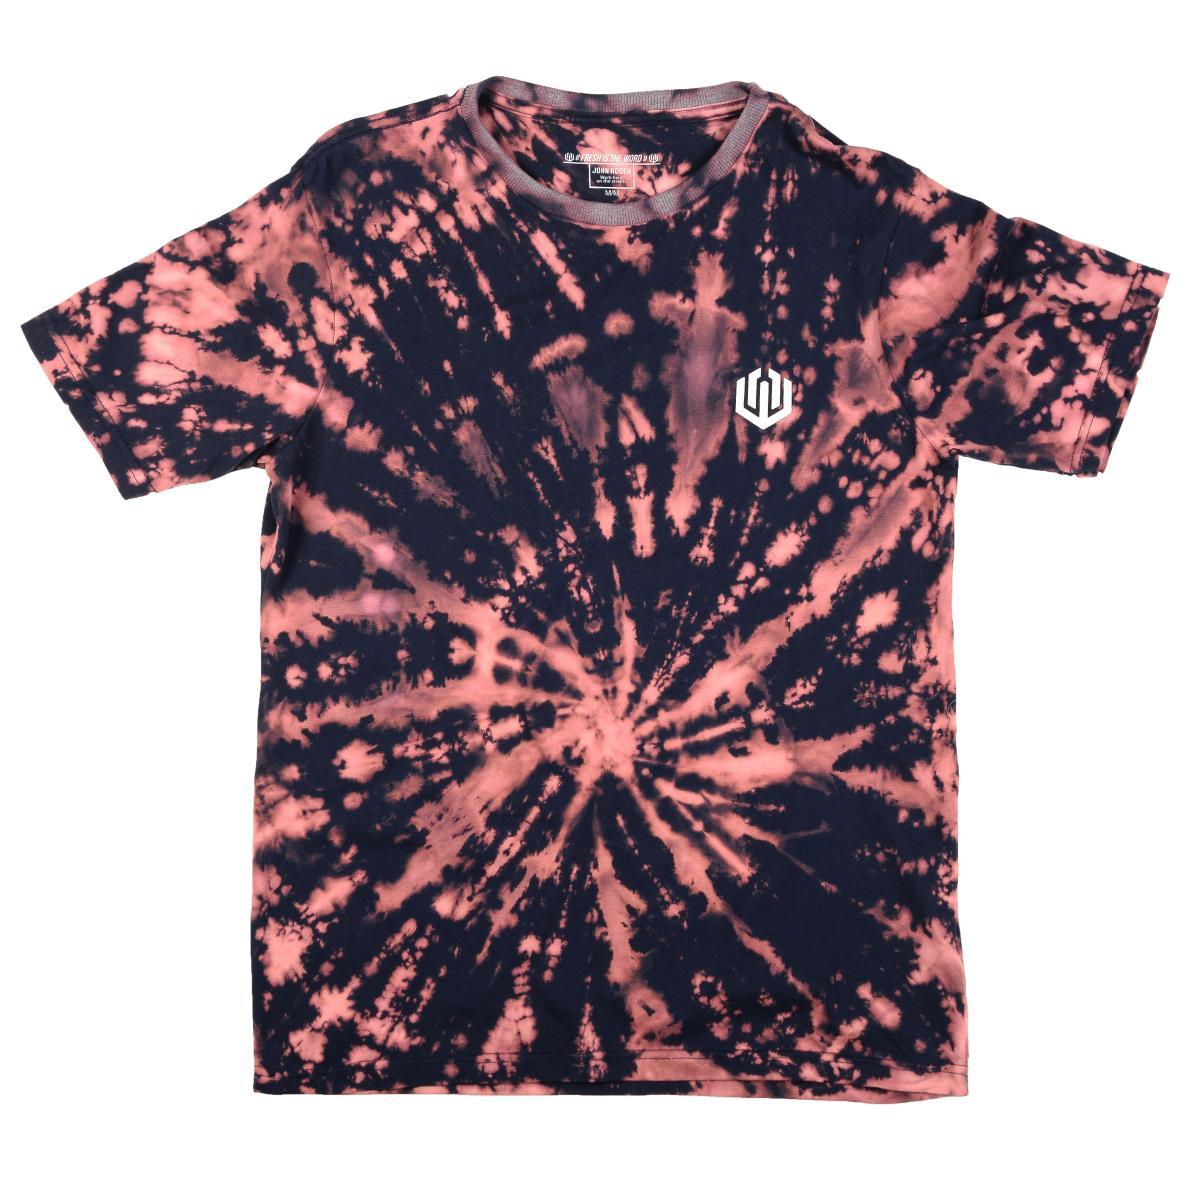 Camiseta John Roger - Tie Dye marinho